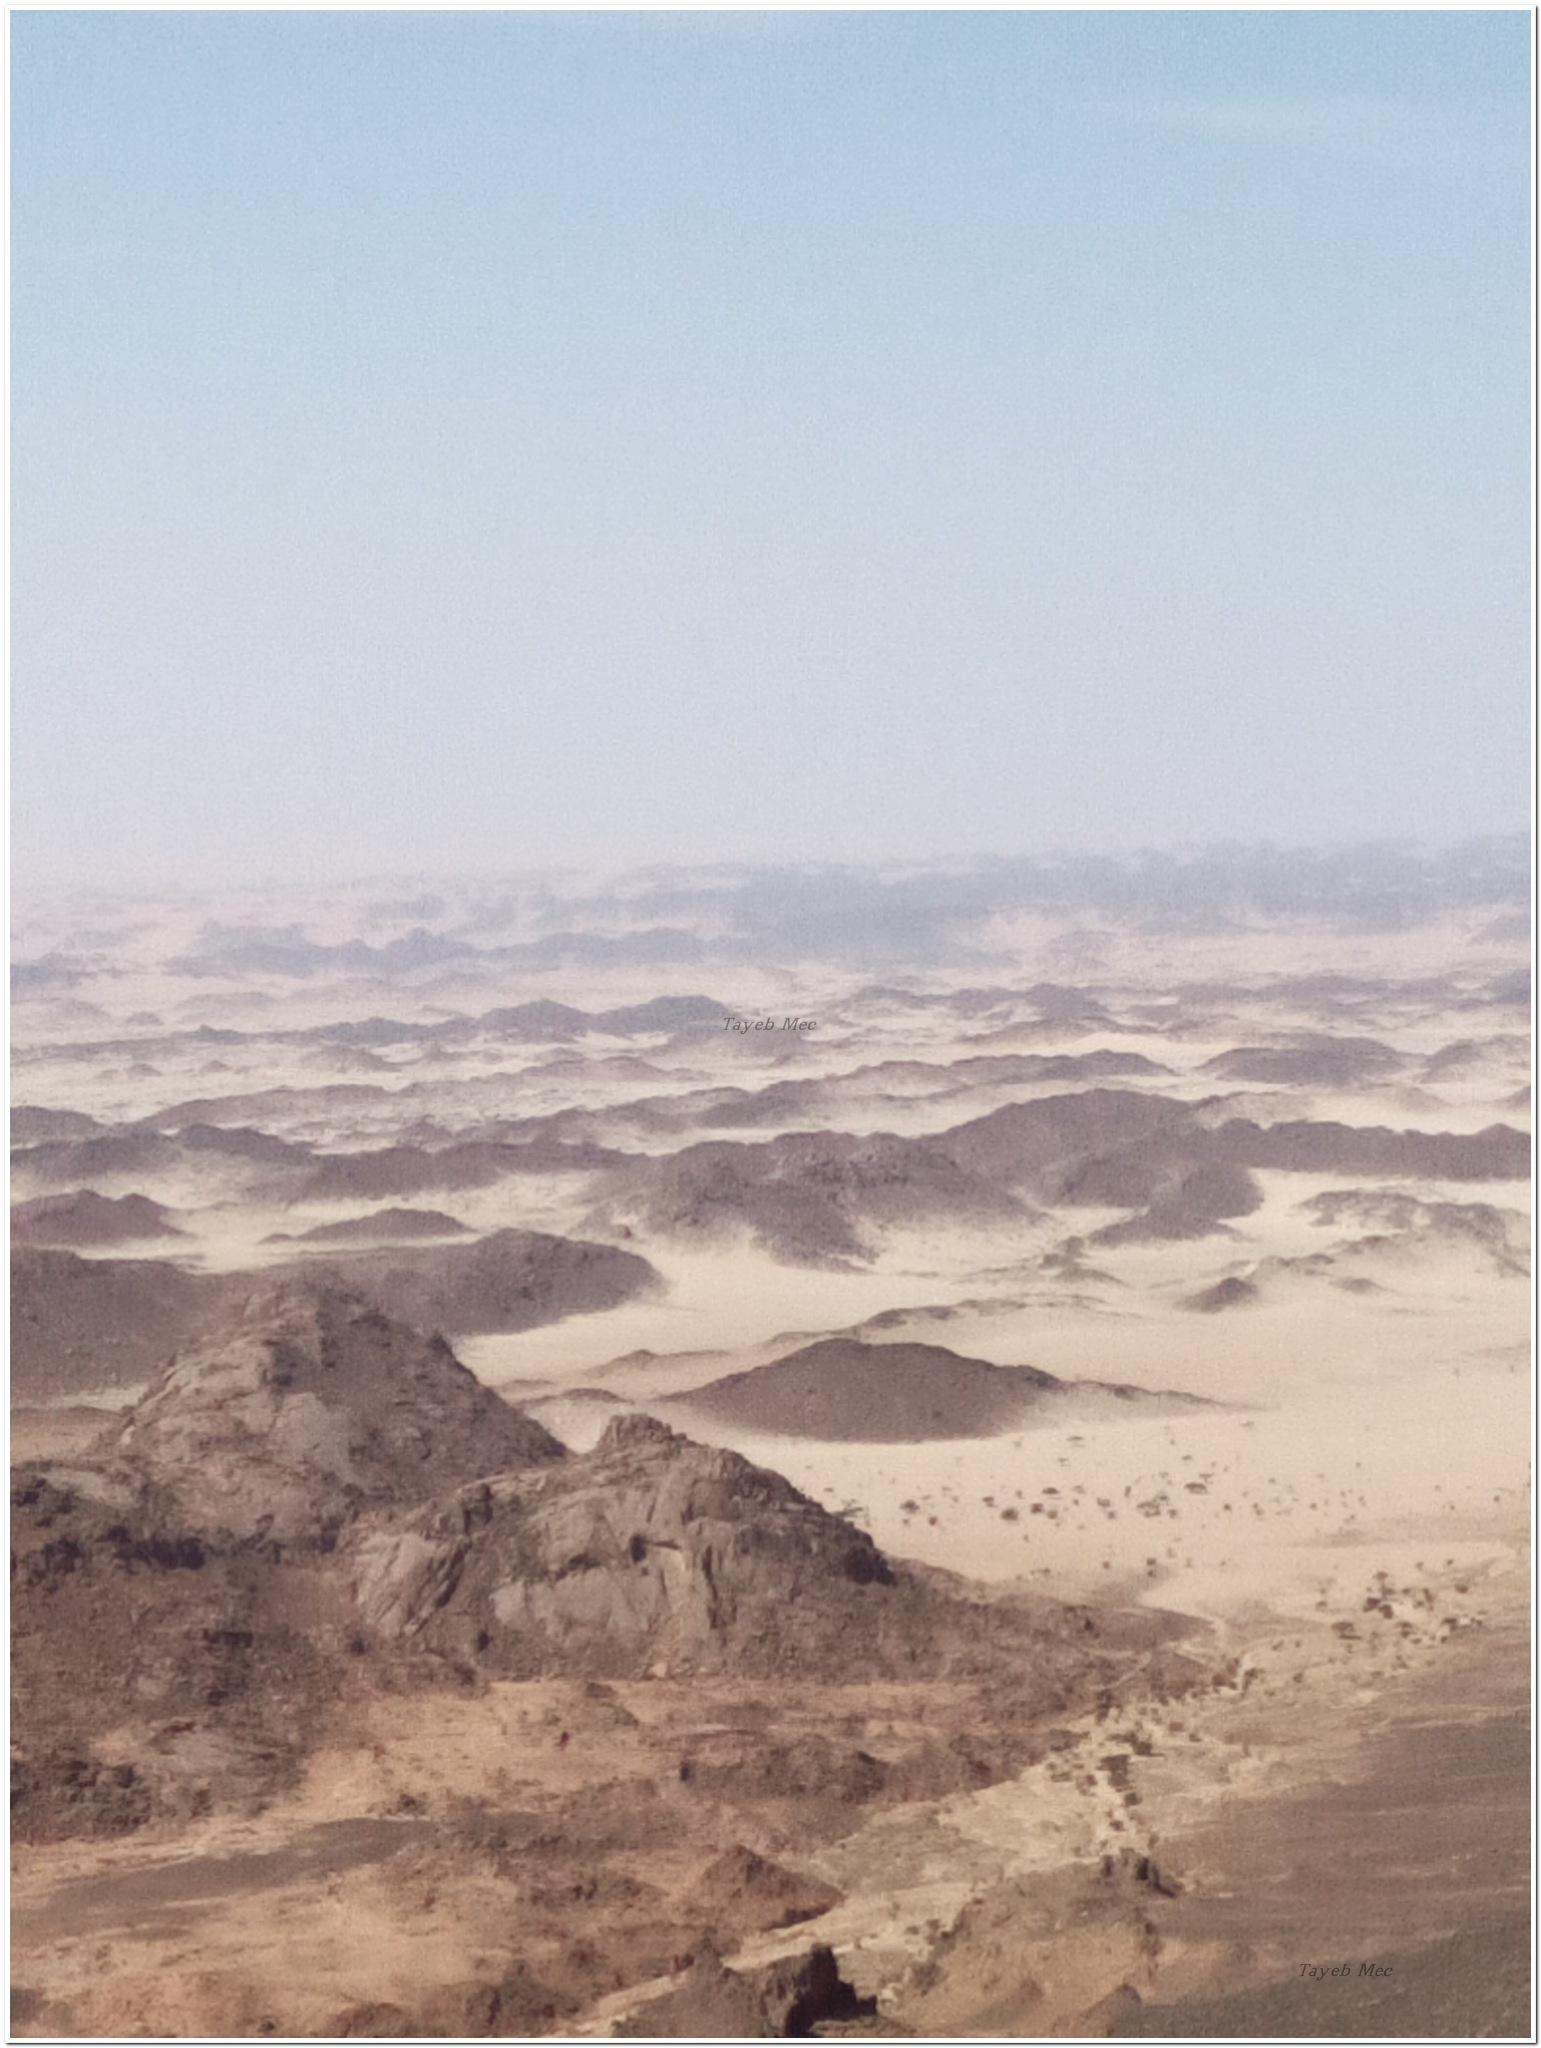 Du haut du Plateau IJABARANE( geant en langue targui) tassili n'ajjer Djanet Algérie  by Tayeb Mechour